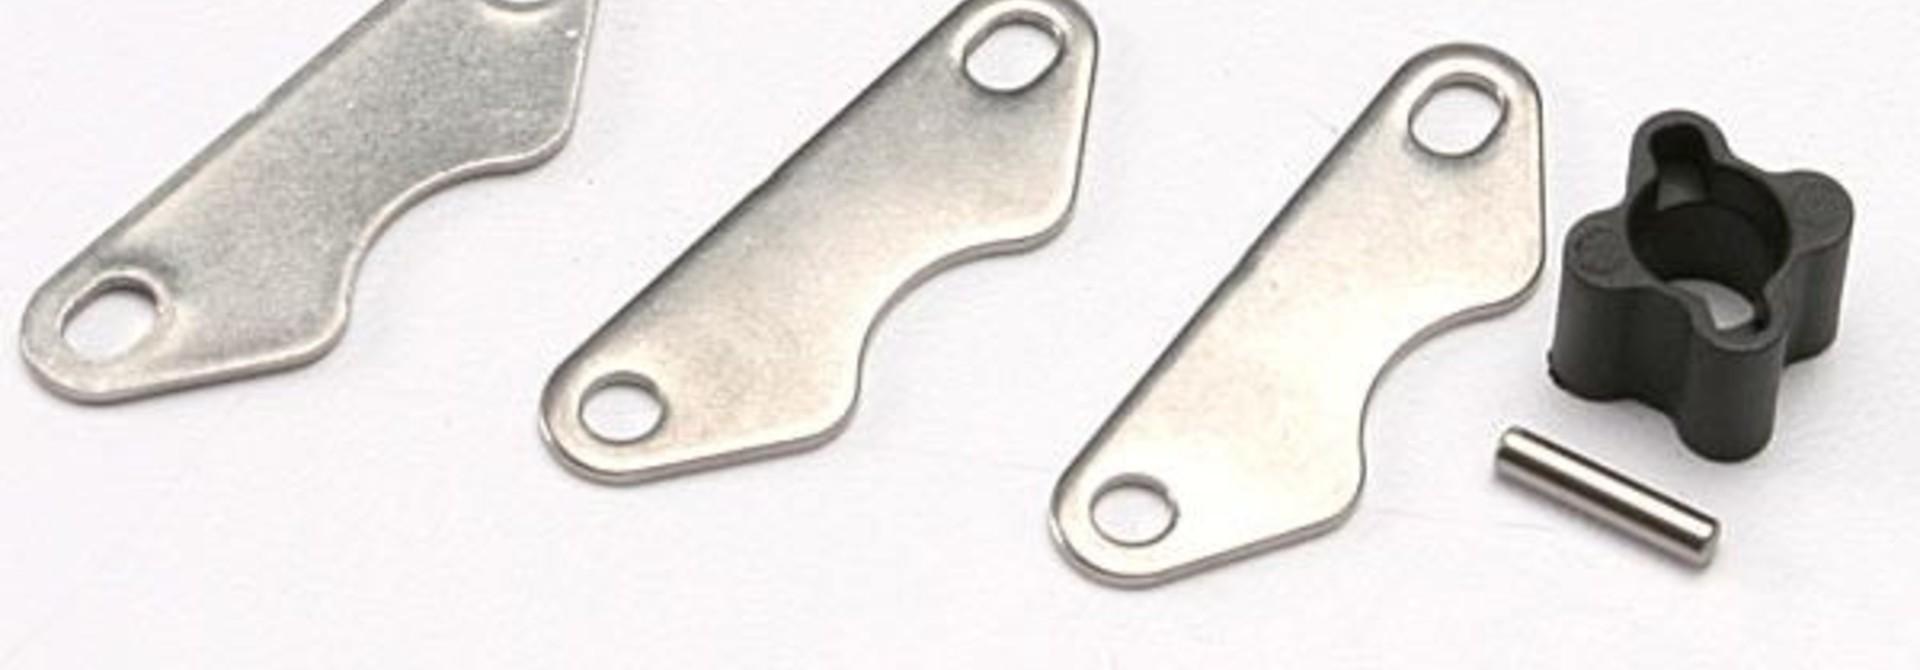 Brake disc hub (for Revo rear brake kit)/ 2mm pin (1)/ brake, TRX5565X